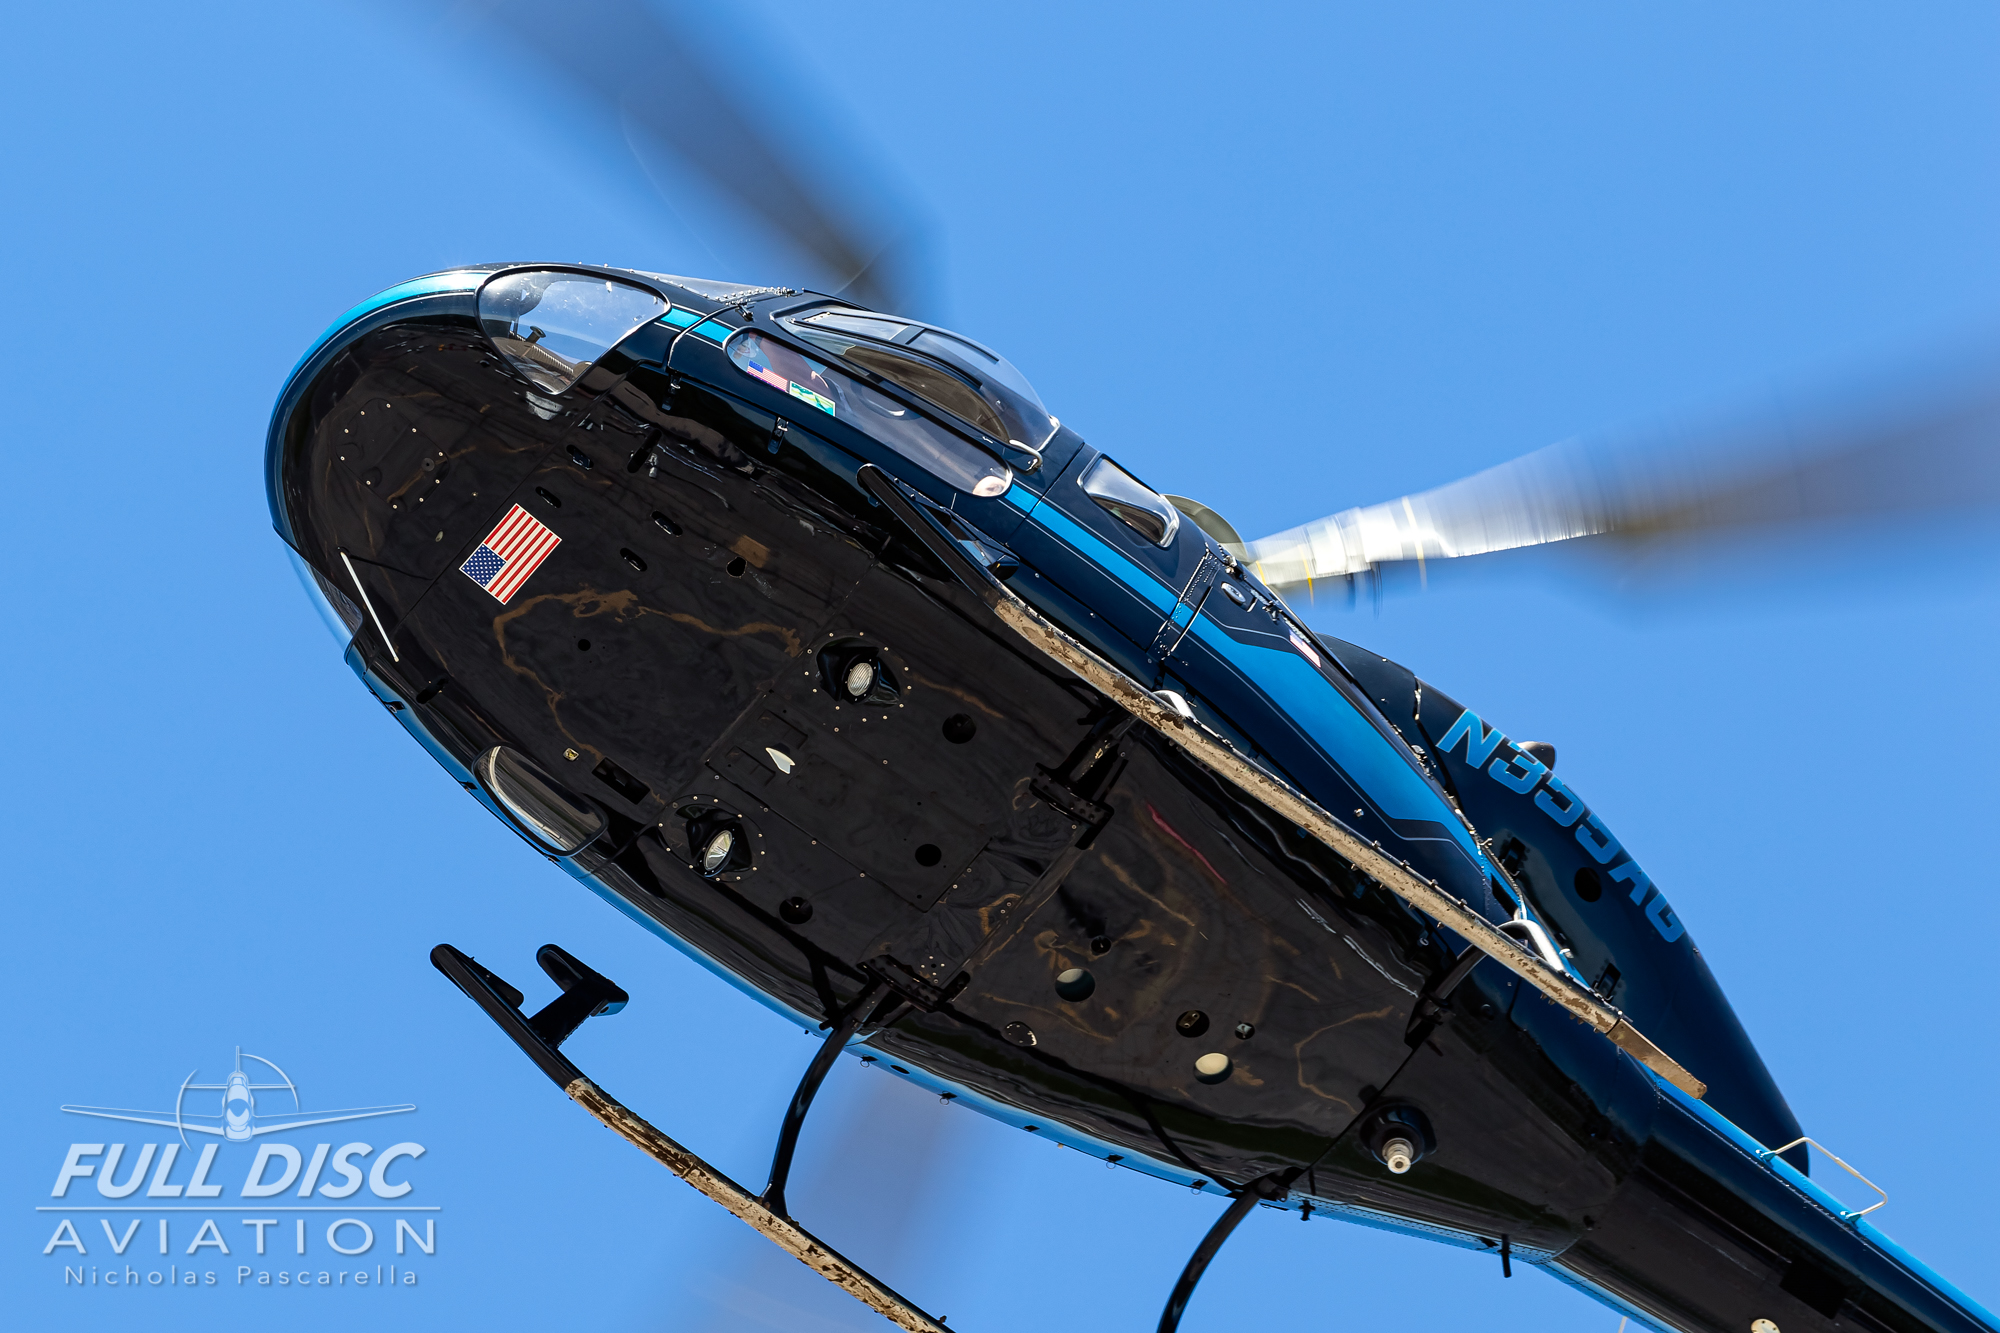 americanairpowermuseum_nicholaspascarella_nickpascarella_fulldiscaviation_legendsofairpower2019_aviation_warbird_helocopter_overhead.jpg